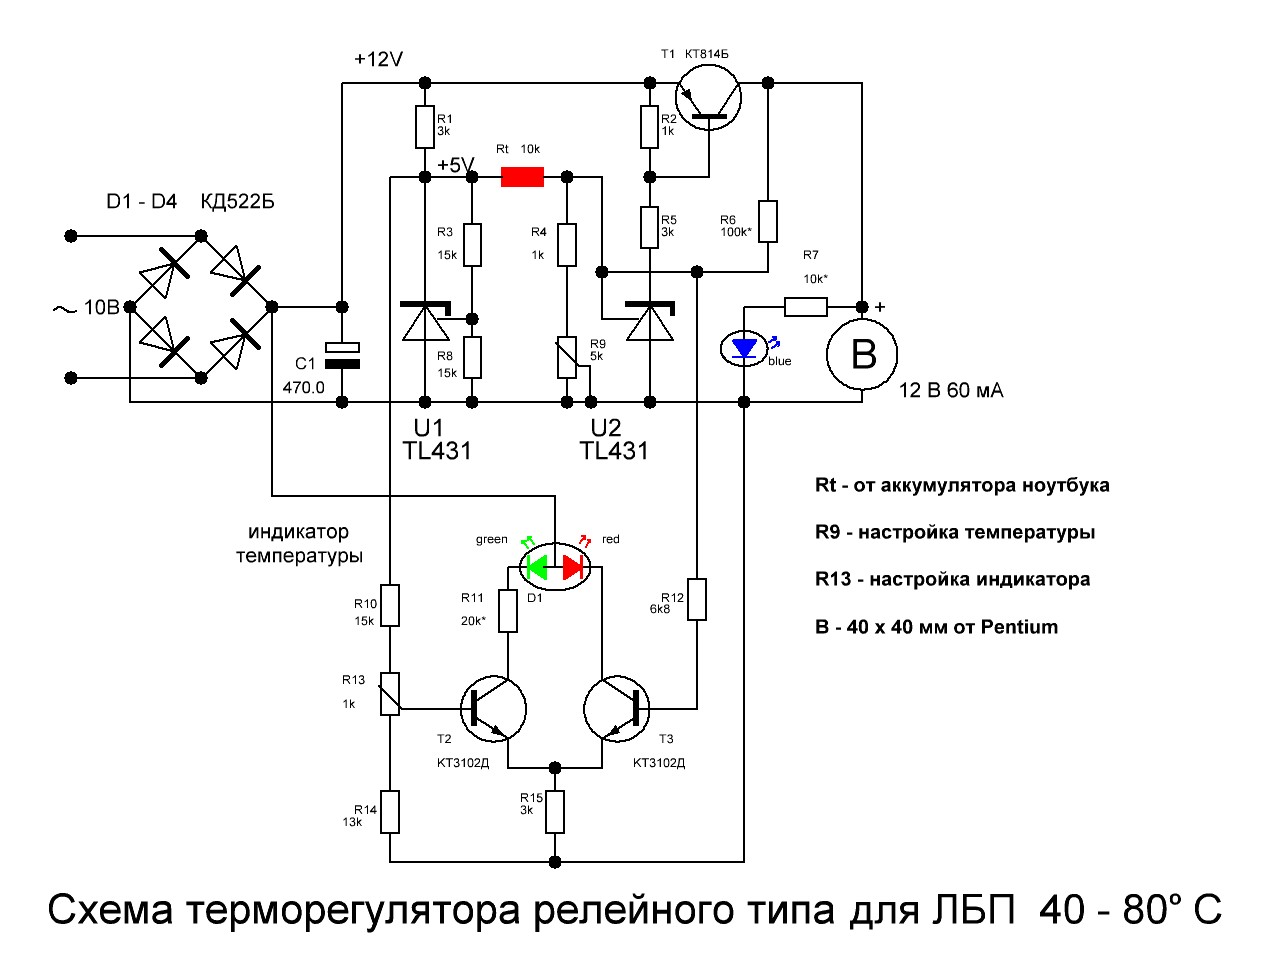 Термодатчик из транзистора своими руками